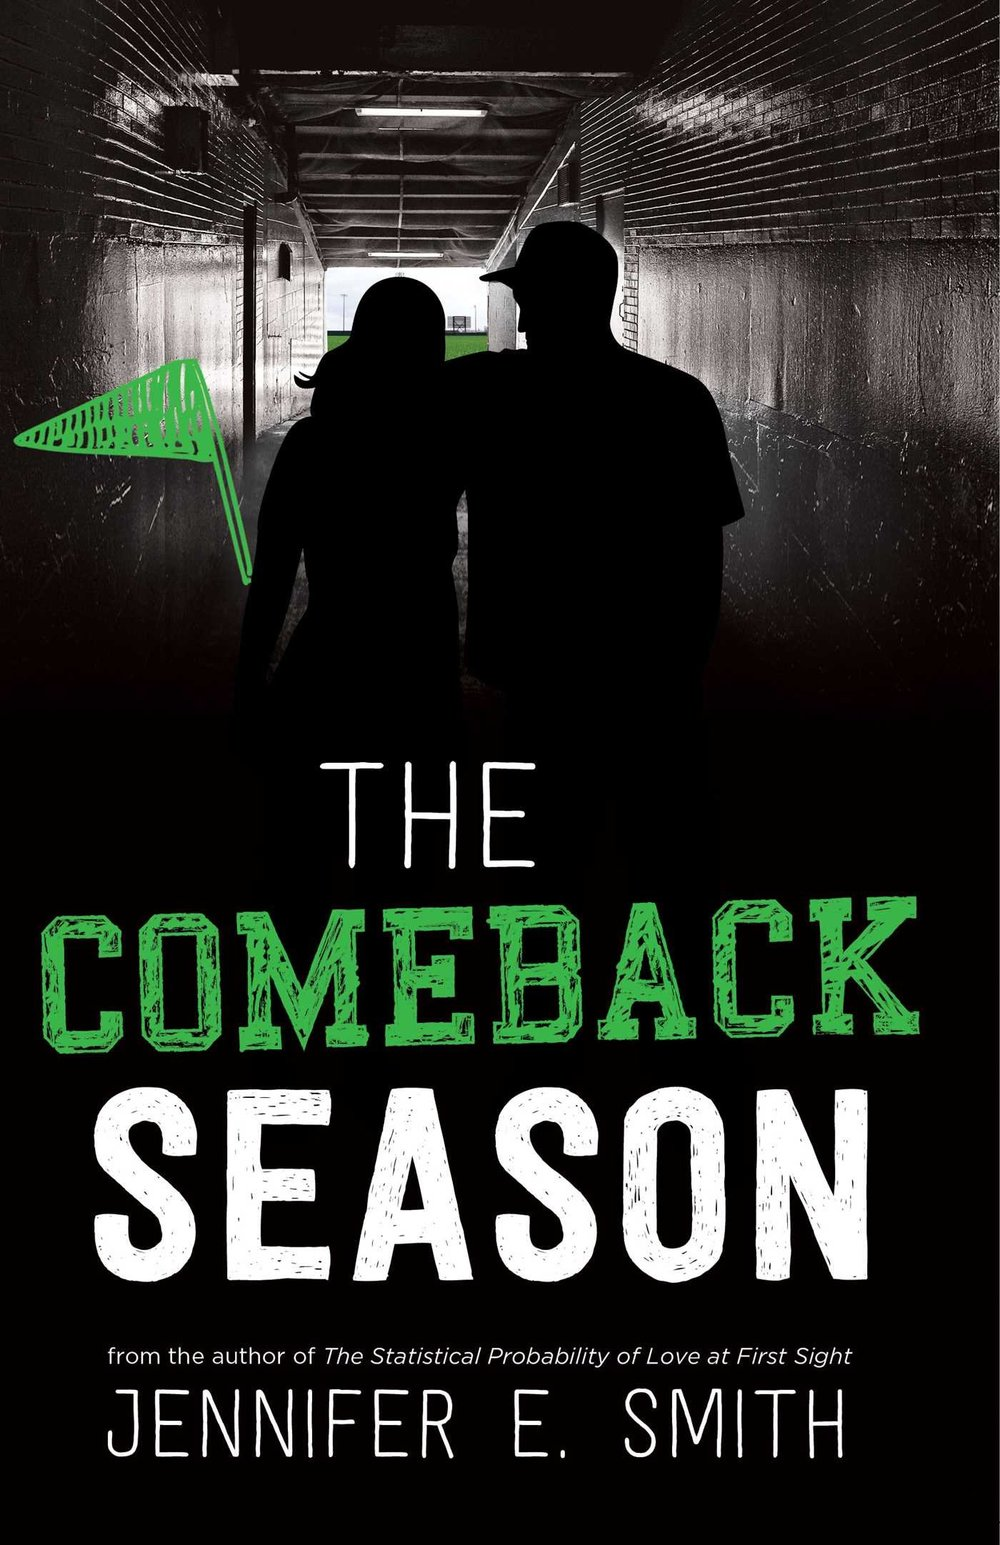 smith-comeback-season.jpg